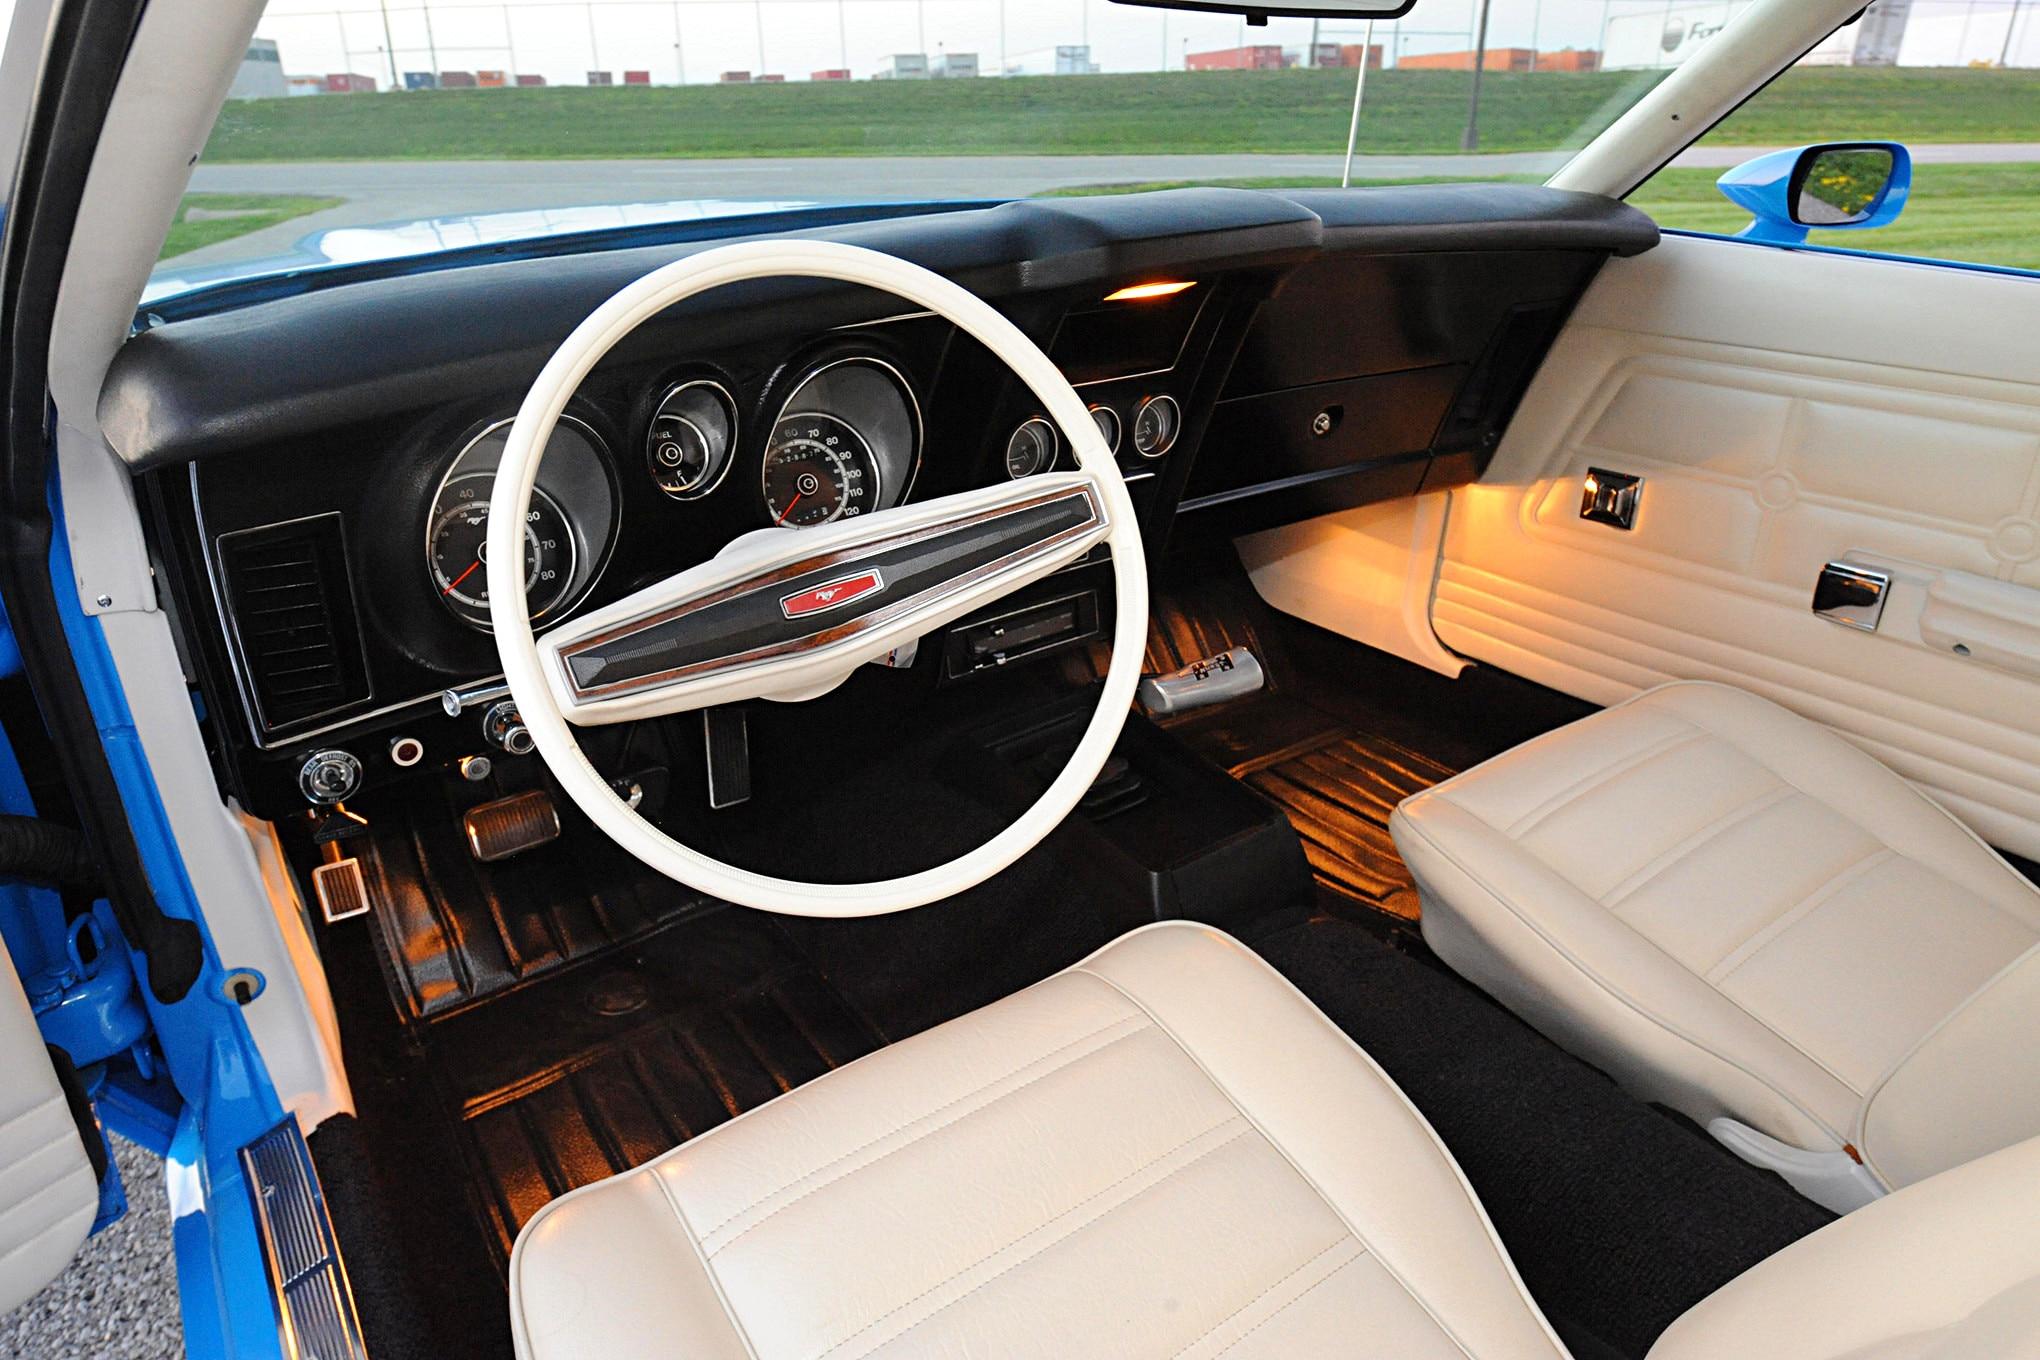 030 1971 73 Mustang SpottersGuide Heasley